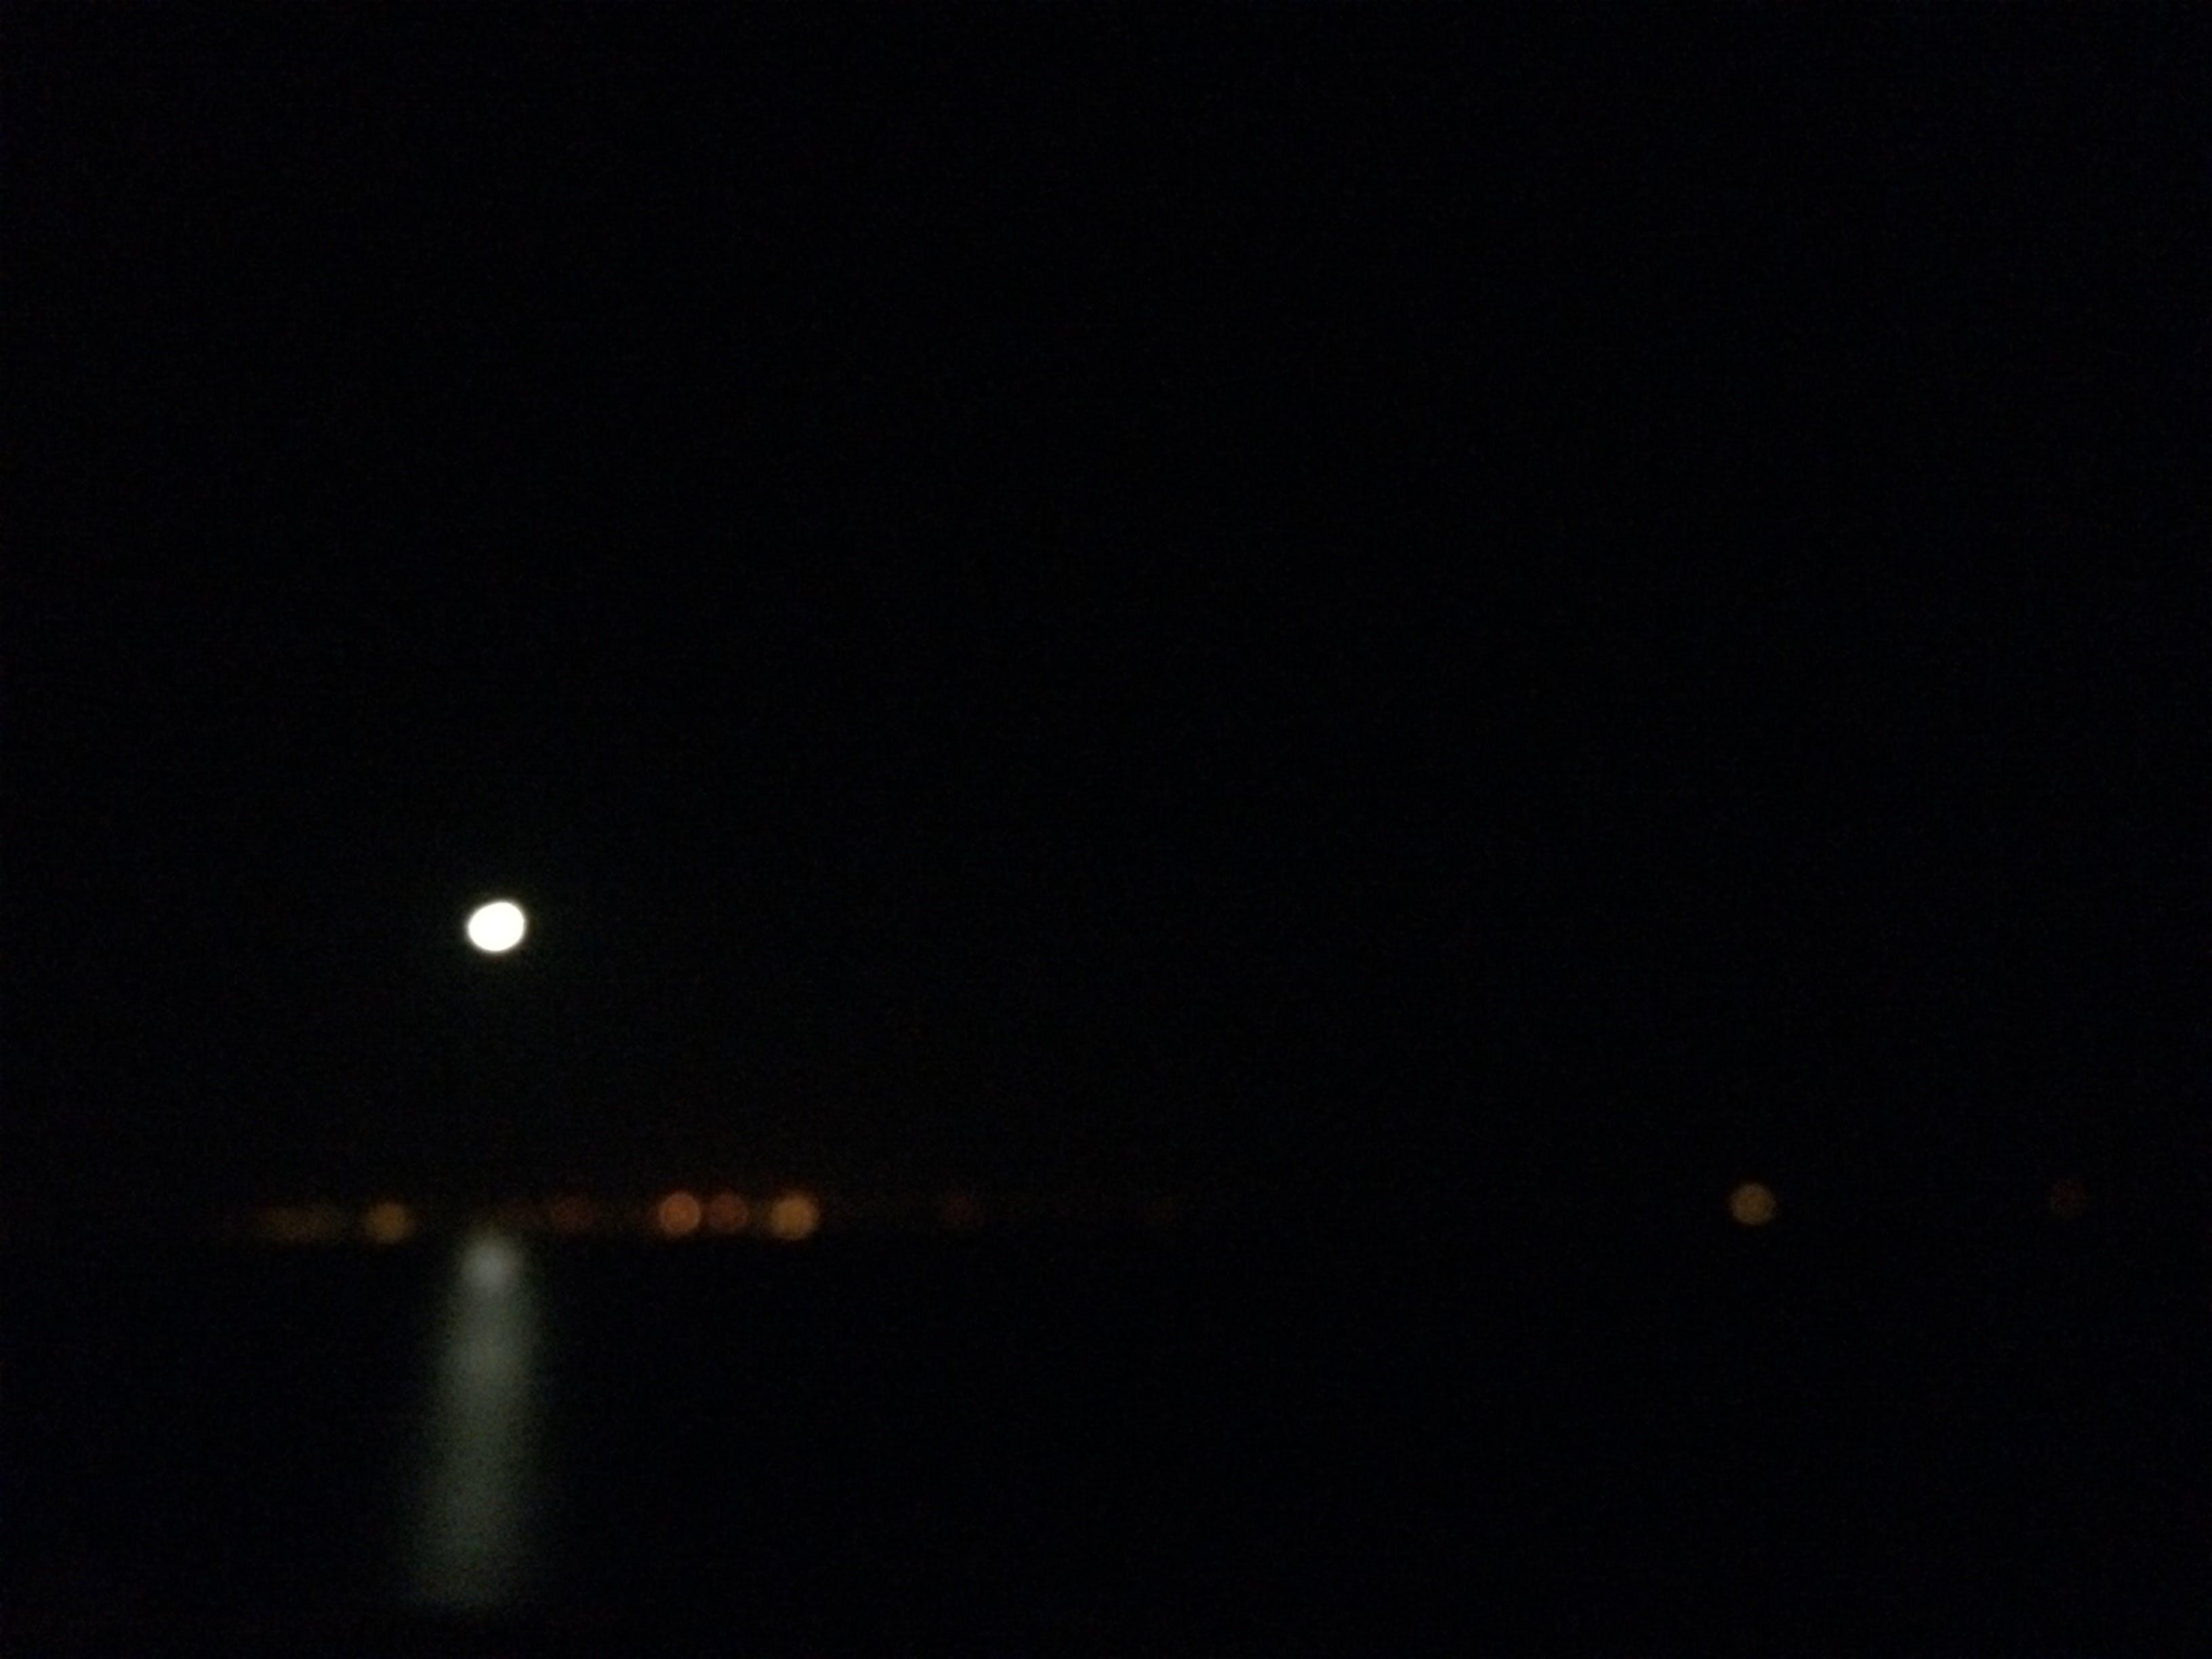 Free stock photo of blur, dark, full moon, lights